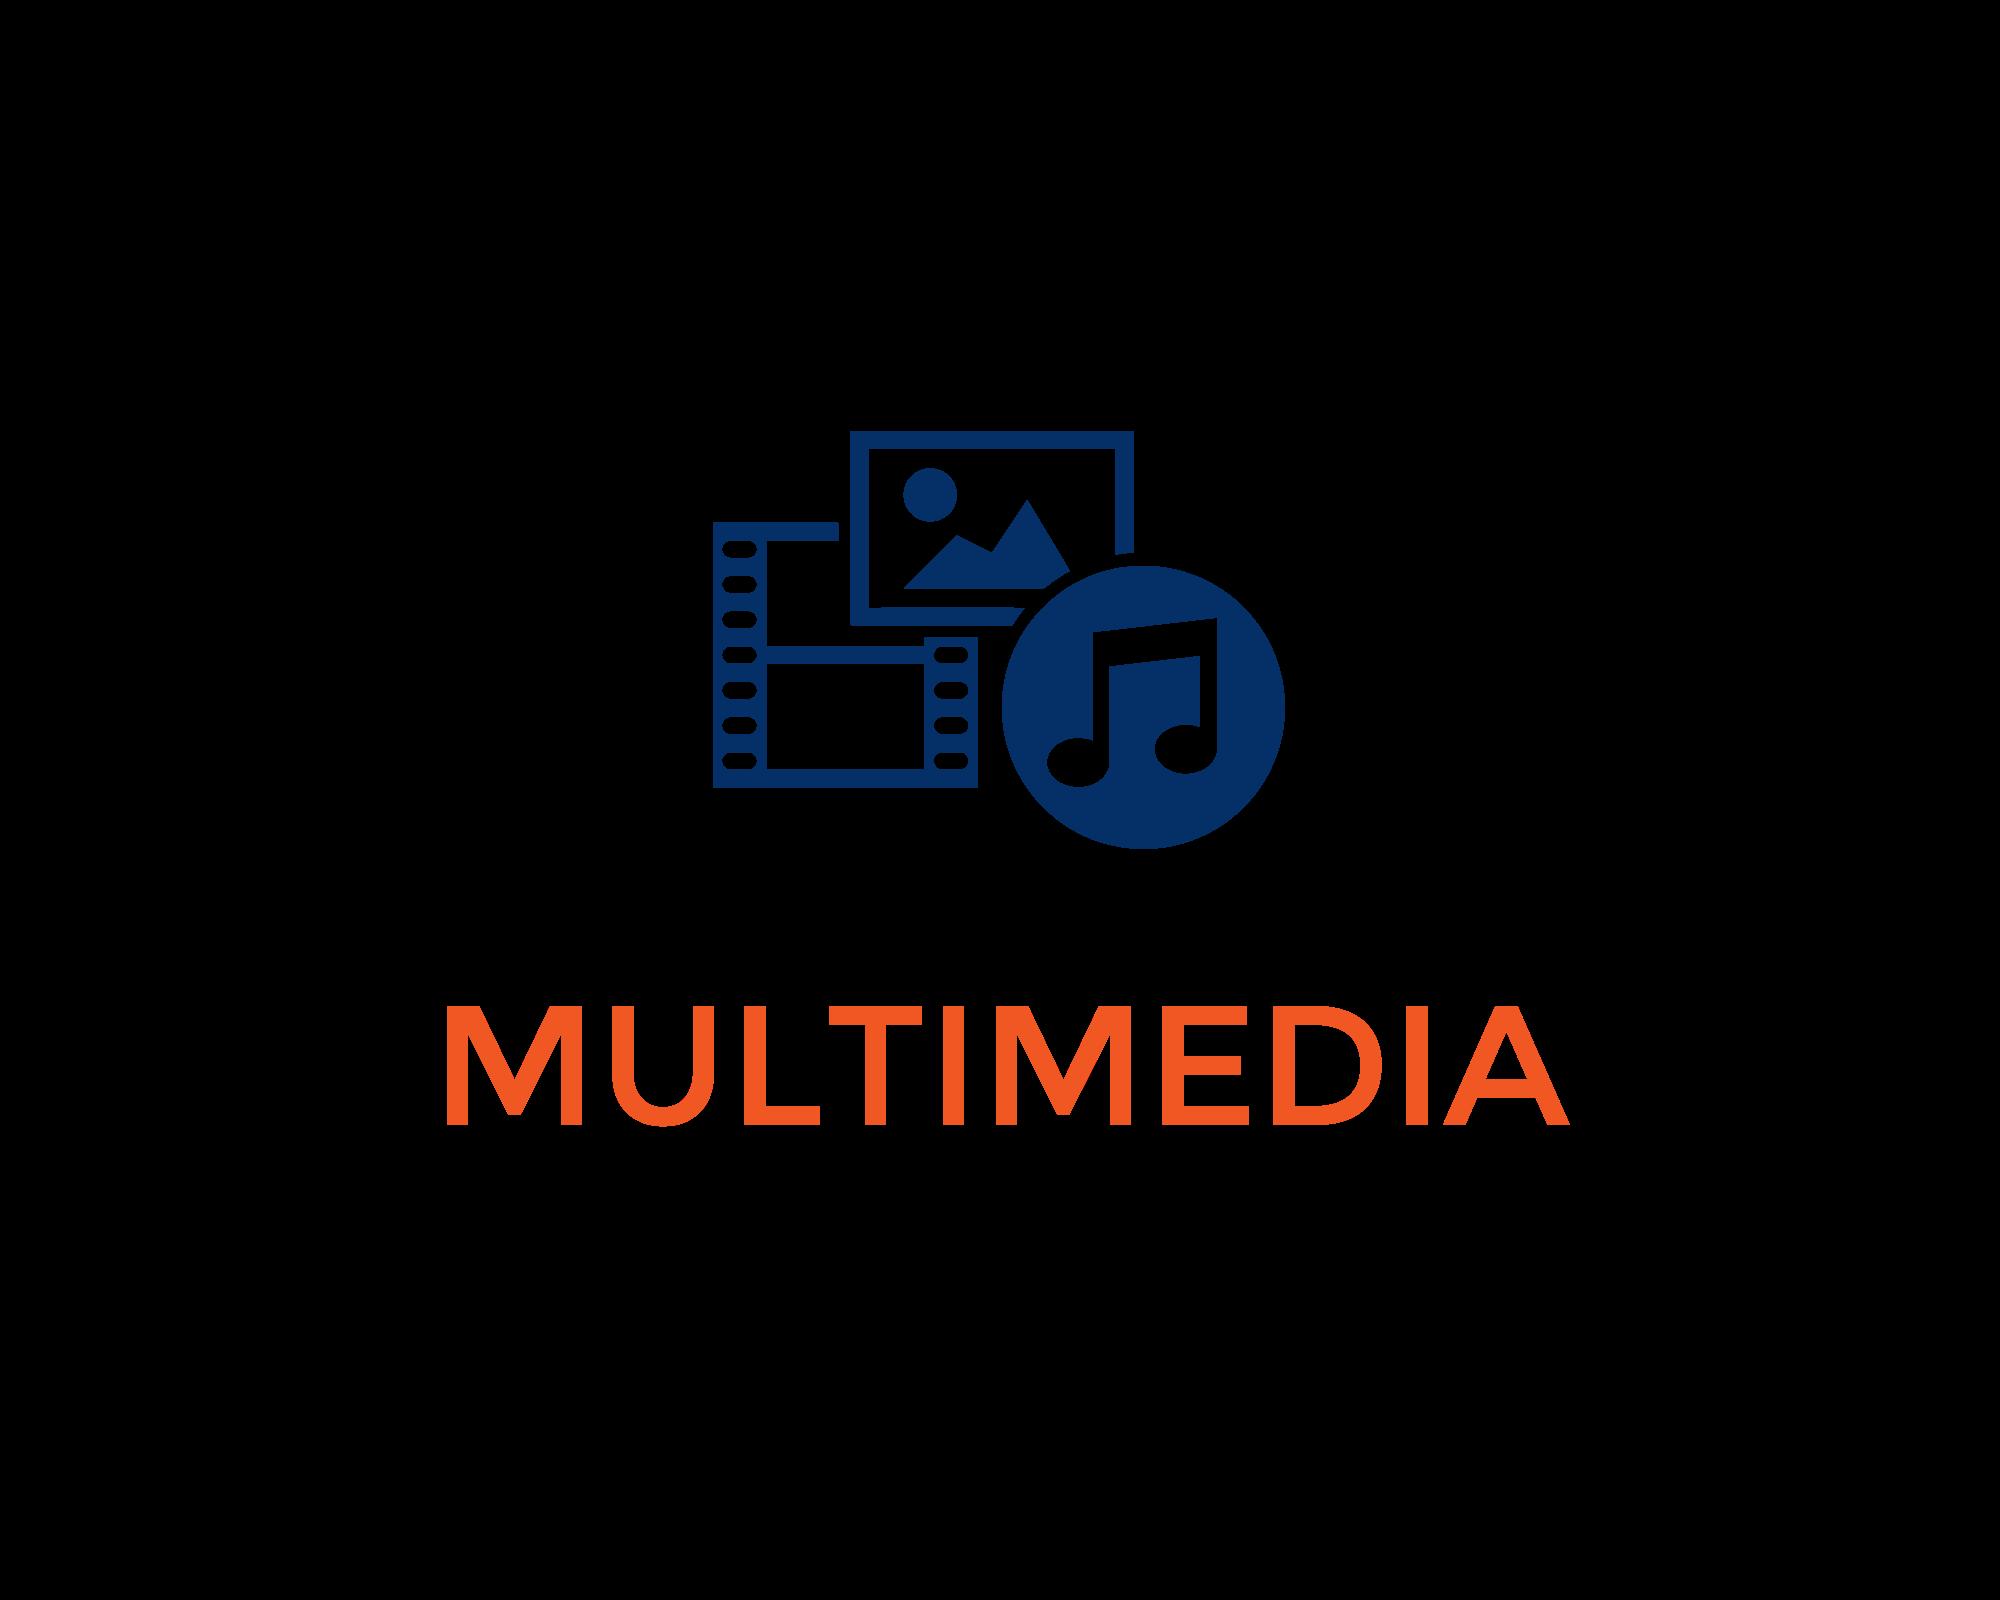 MULTIMEDIA-logo.png